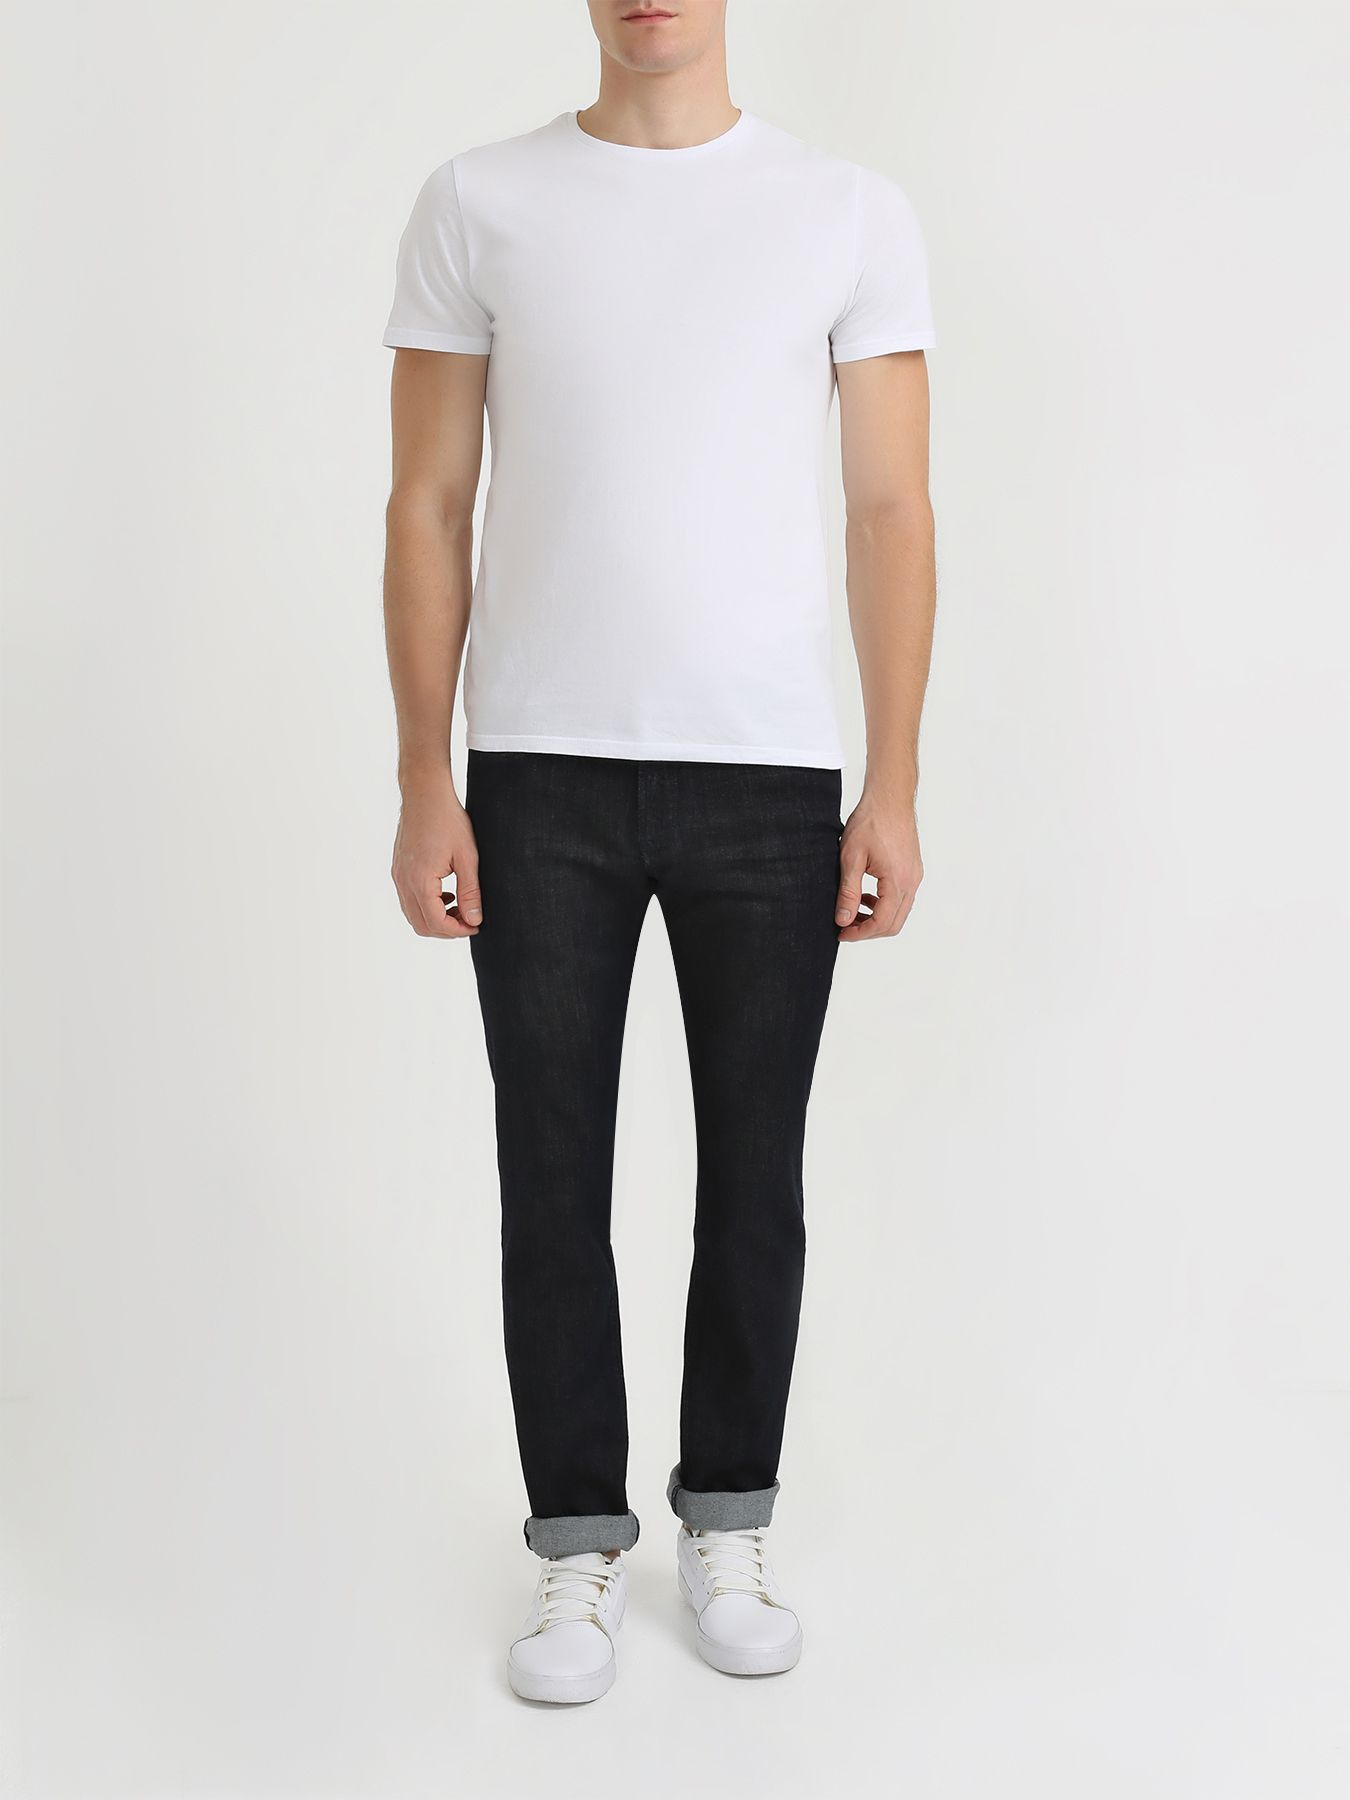 Брюки Korpo Зауженные джинсы брюки korpo прямые джинсы